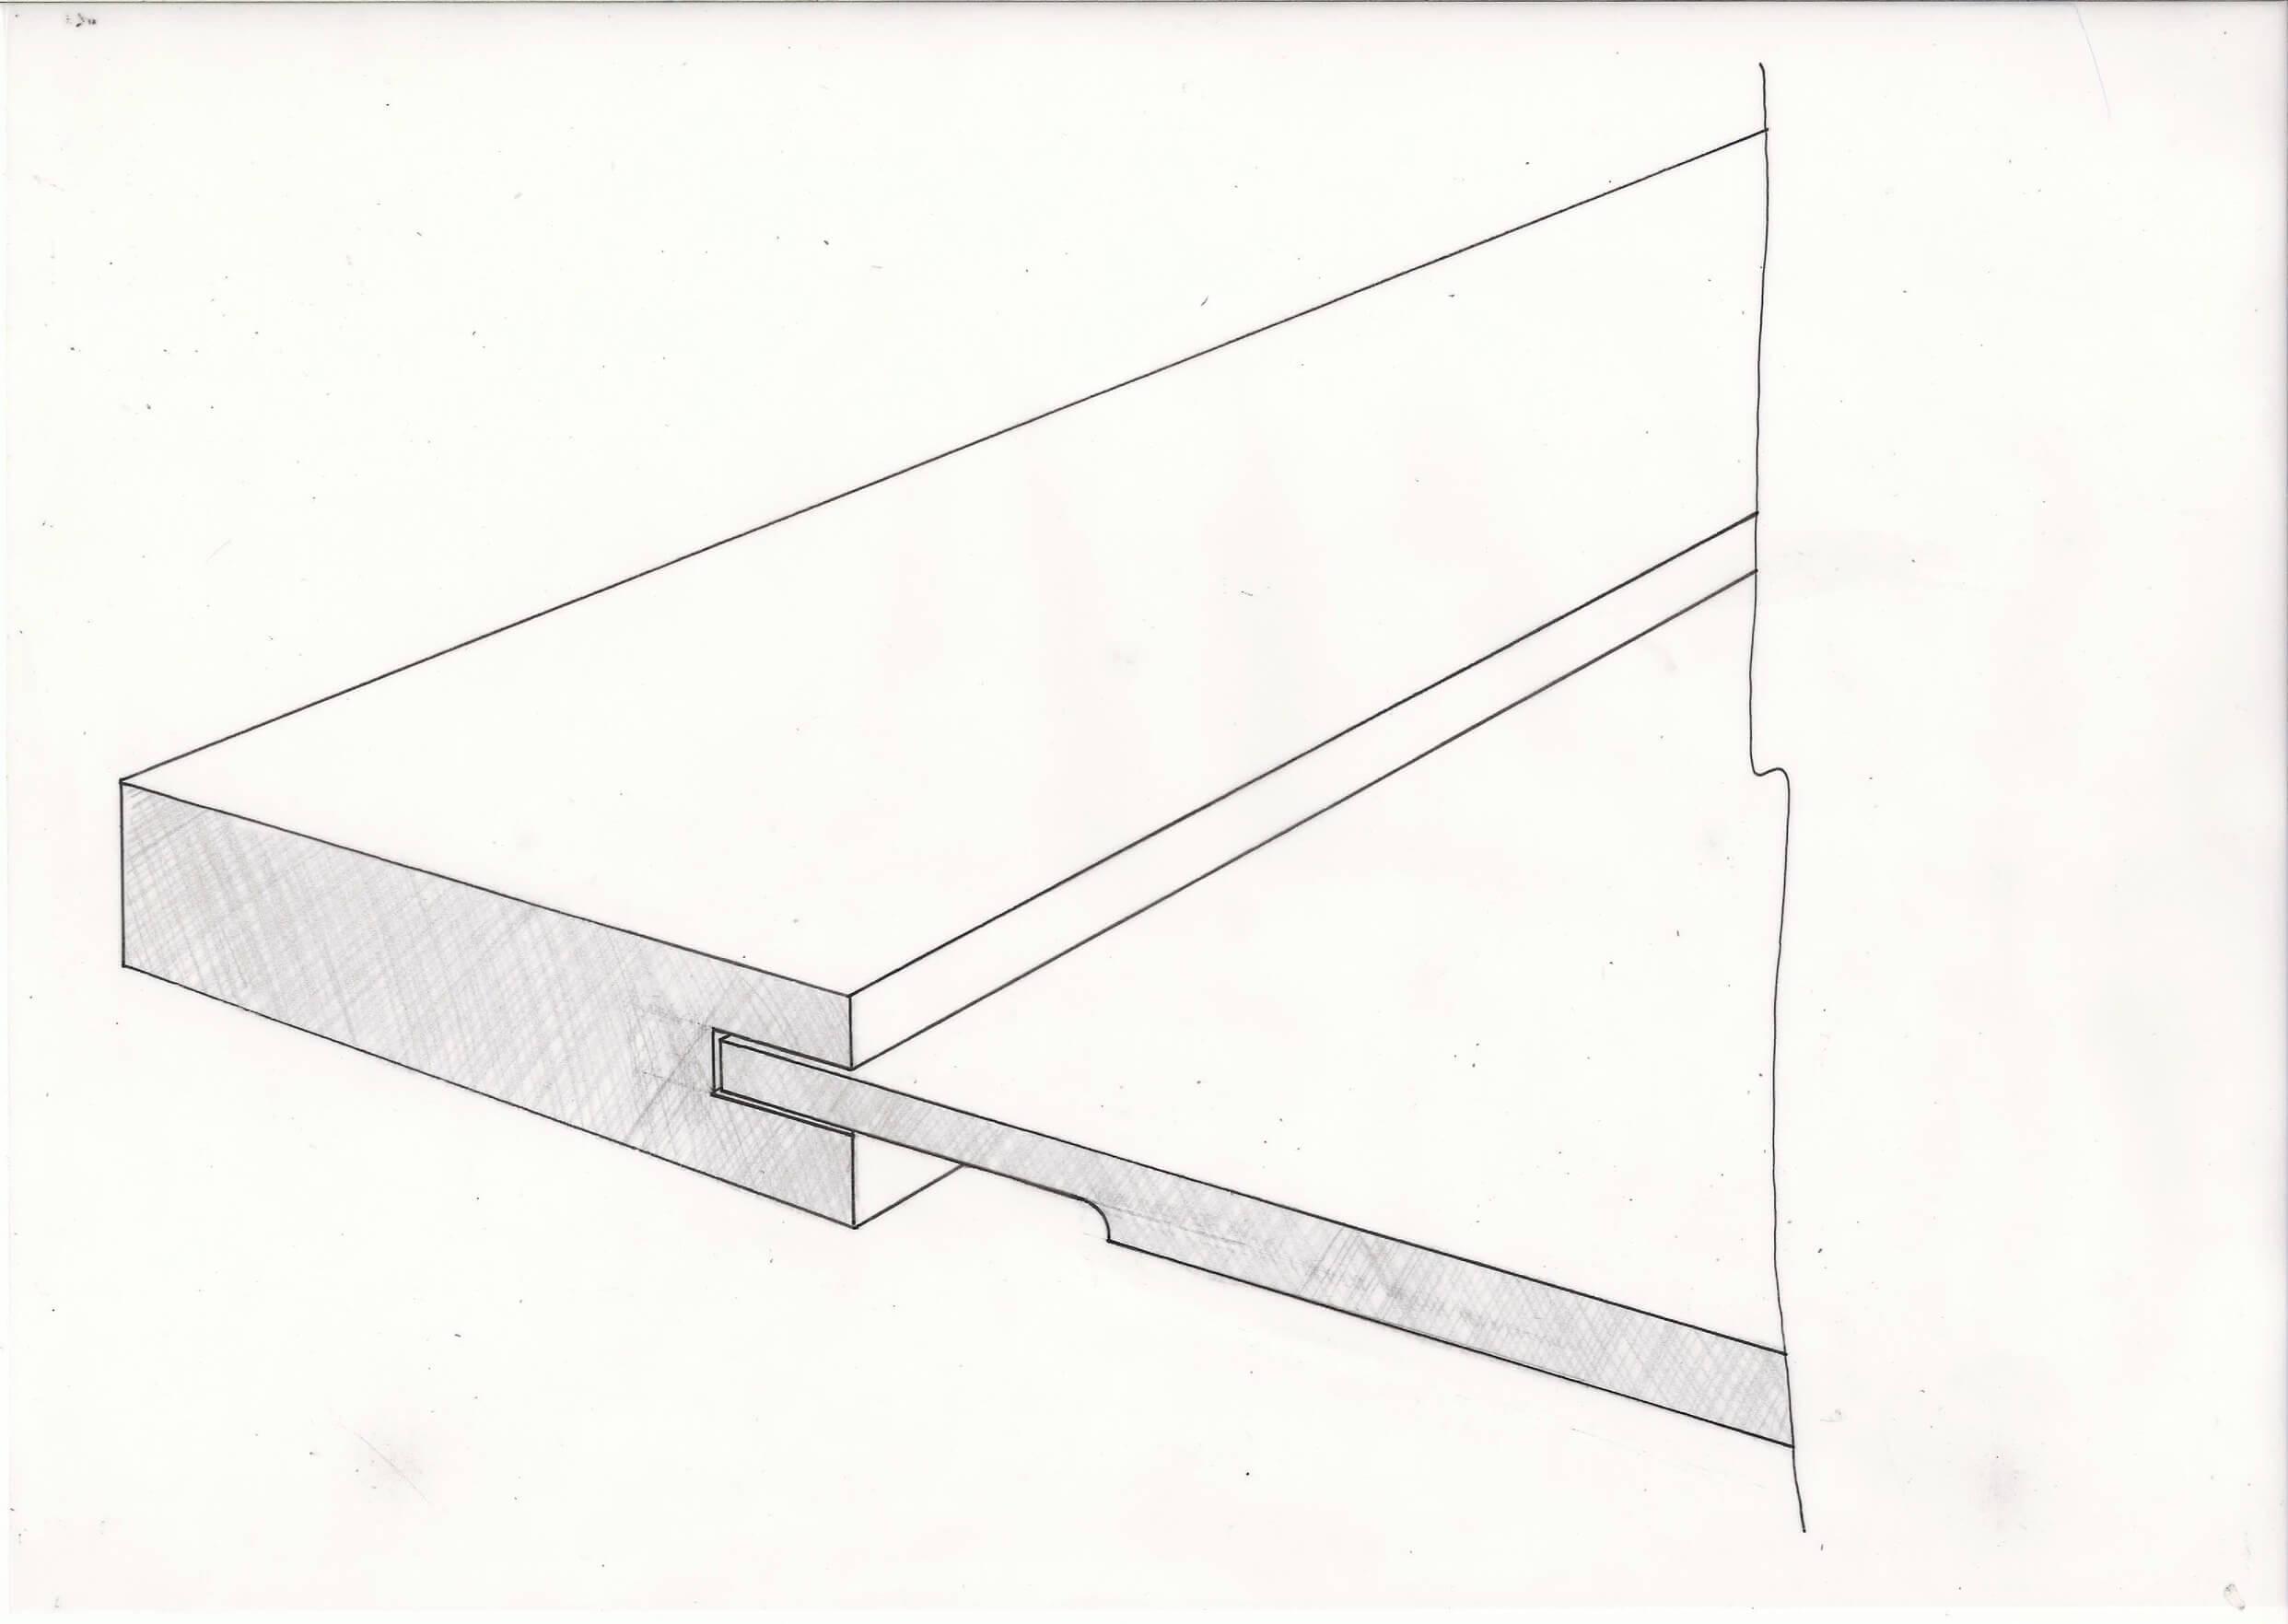 Macintosh sketch